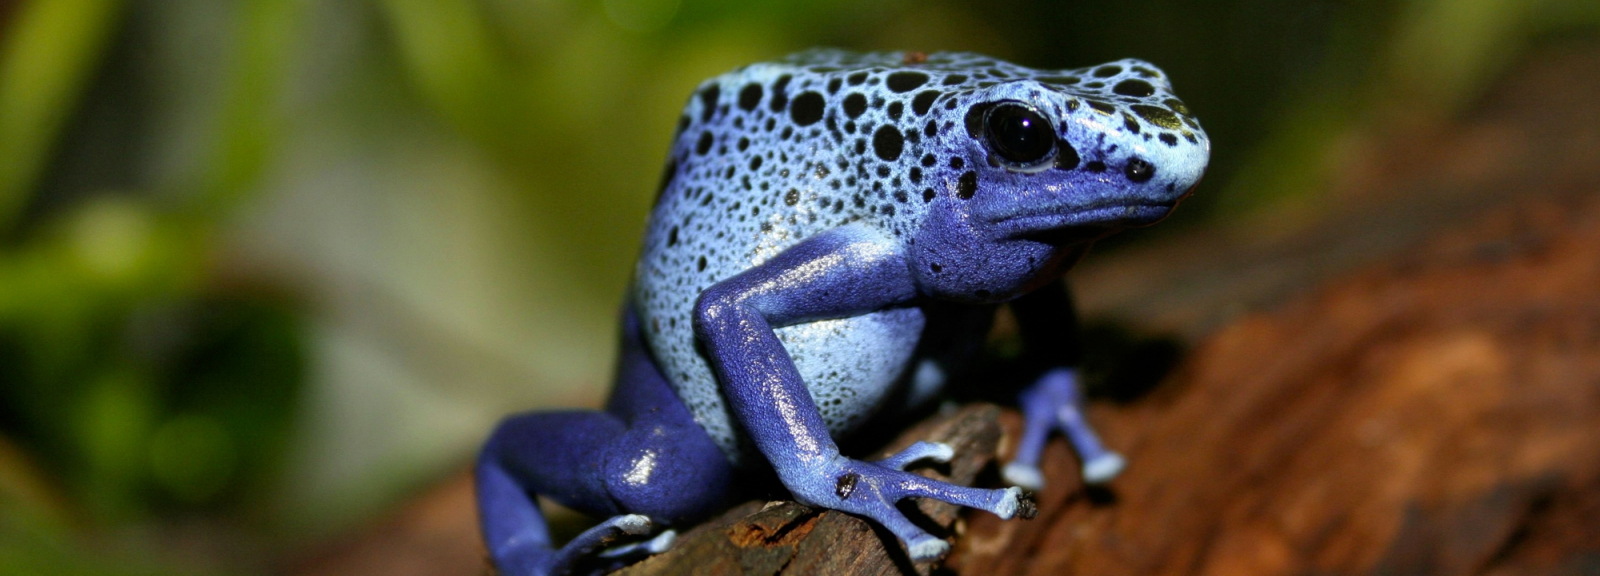 Dendrobate bleu (Dendrobates azureus) © MNHN - Christelle Hano